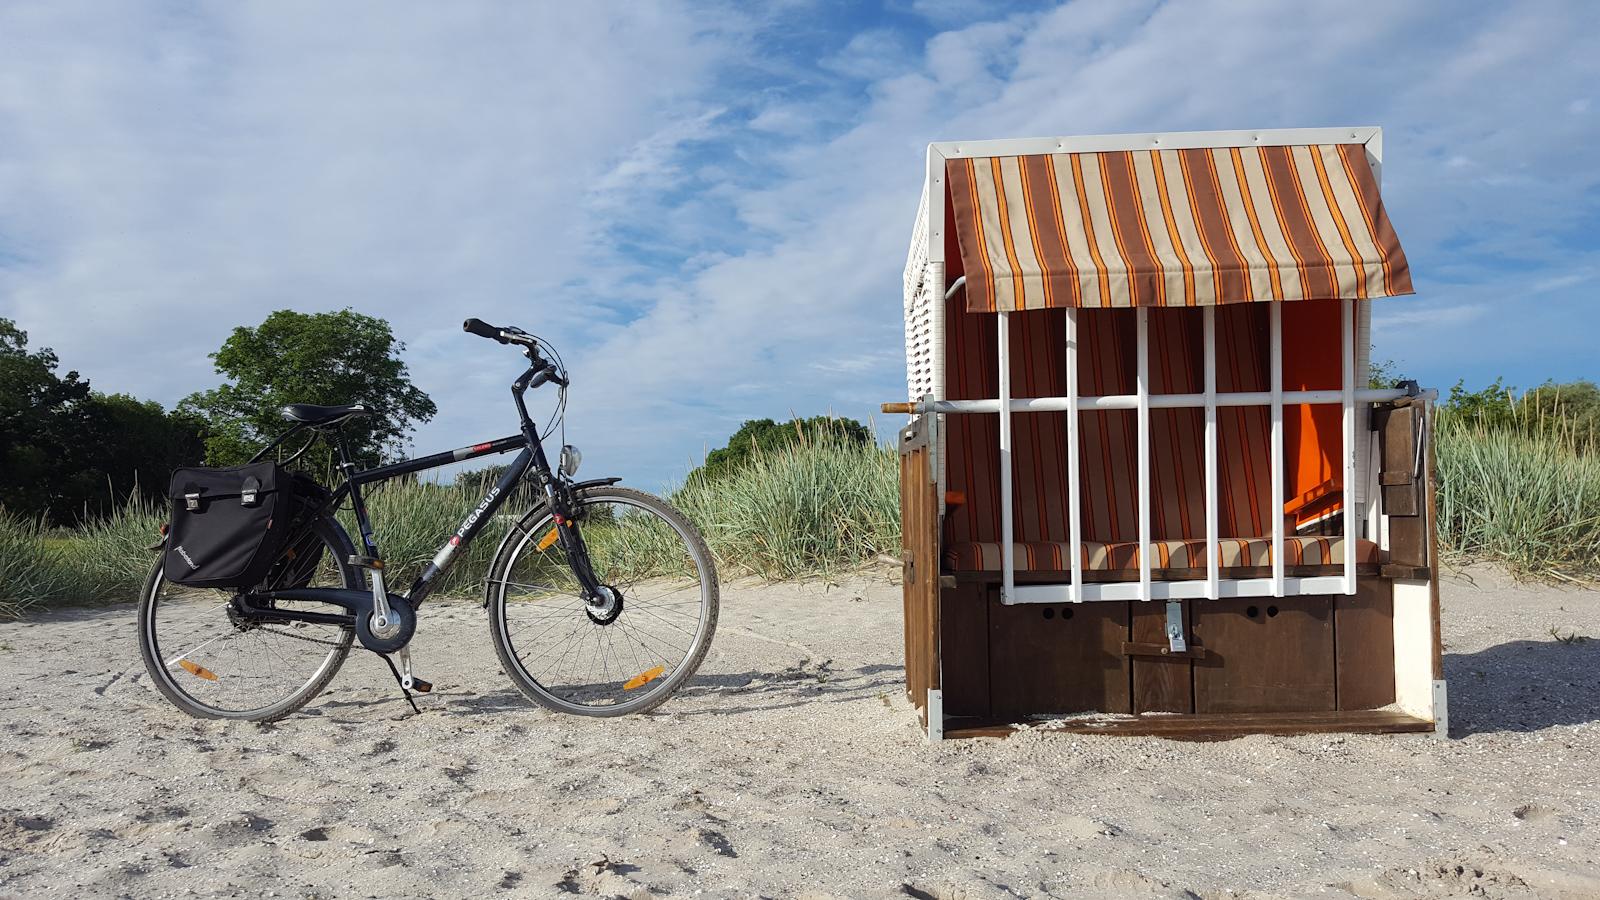 Strand in Greifswald-Eldena